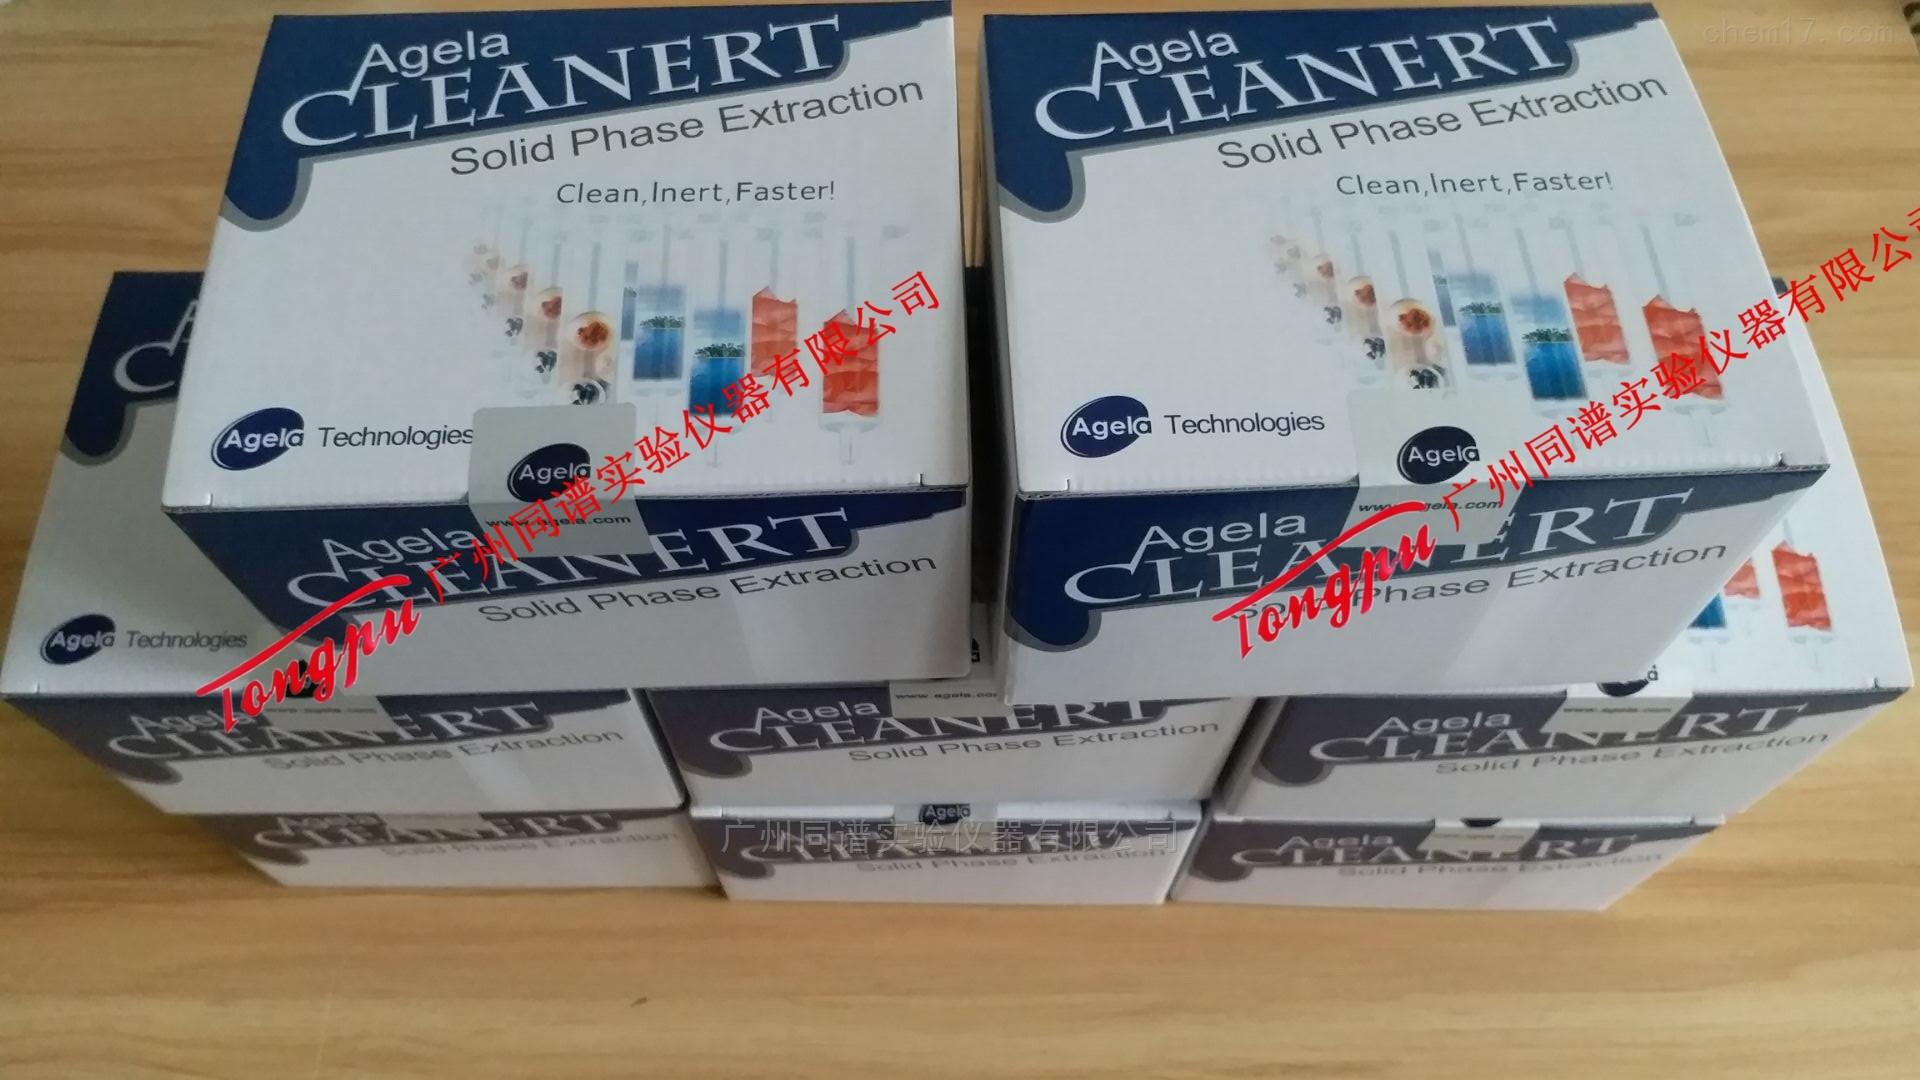 艾杰尔Cleanert SUL-5(磺胺柱)